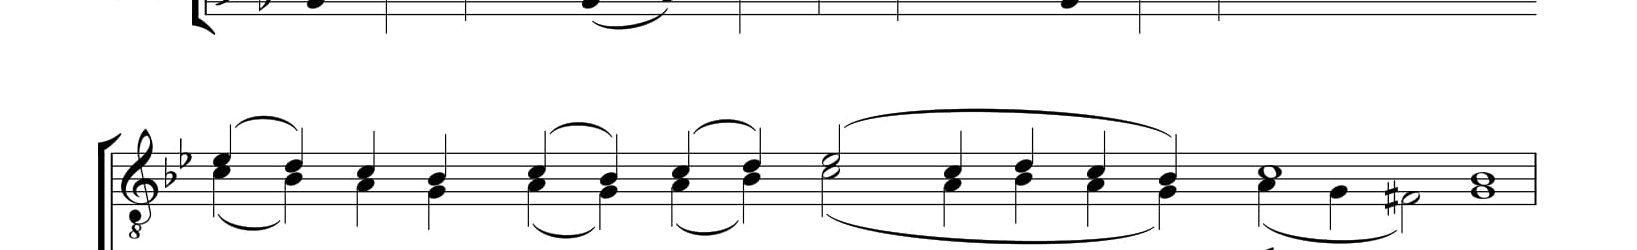 Догматик, глас 8 (Знаменное)